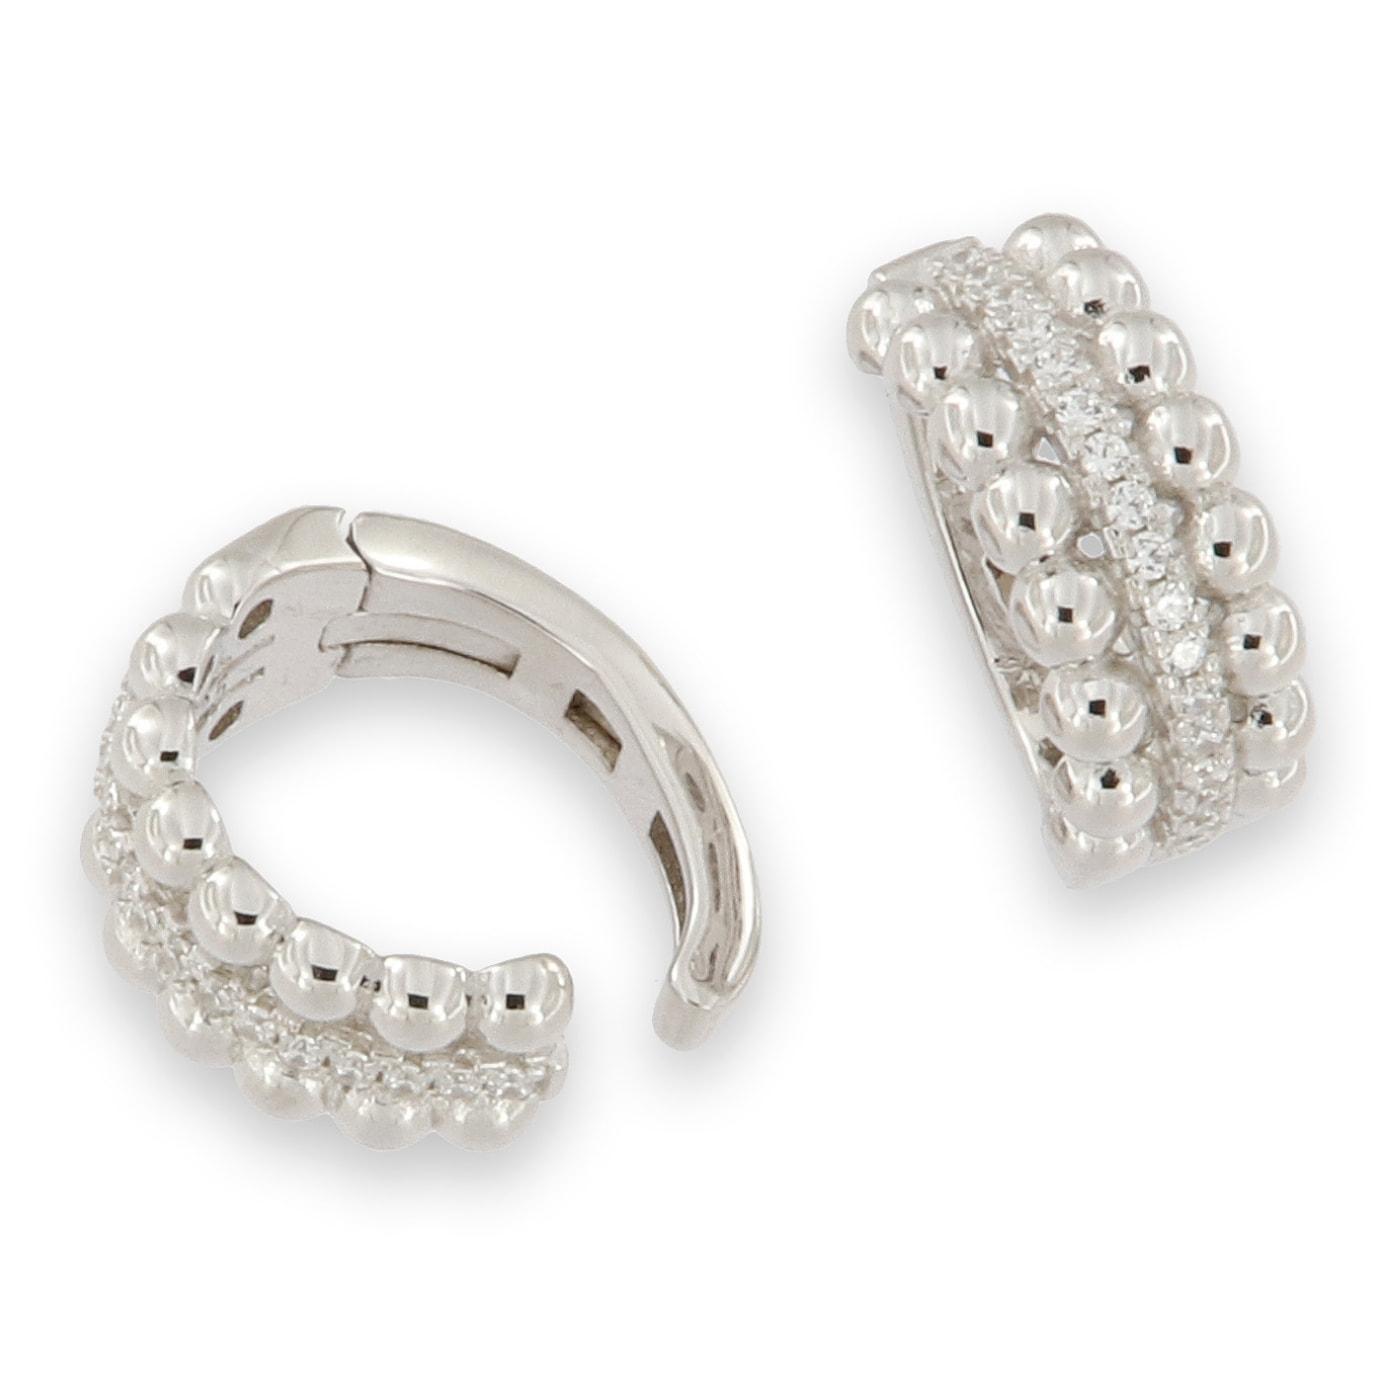 Earcuff - äkta silver - med kristaller - fake earcuff